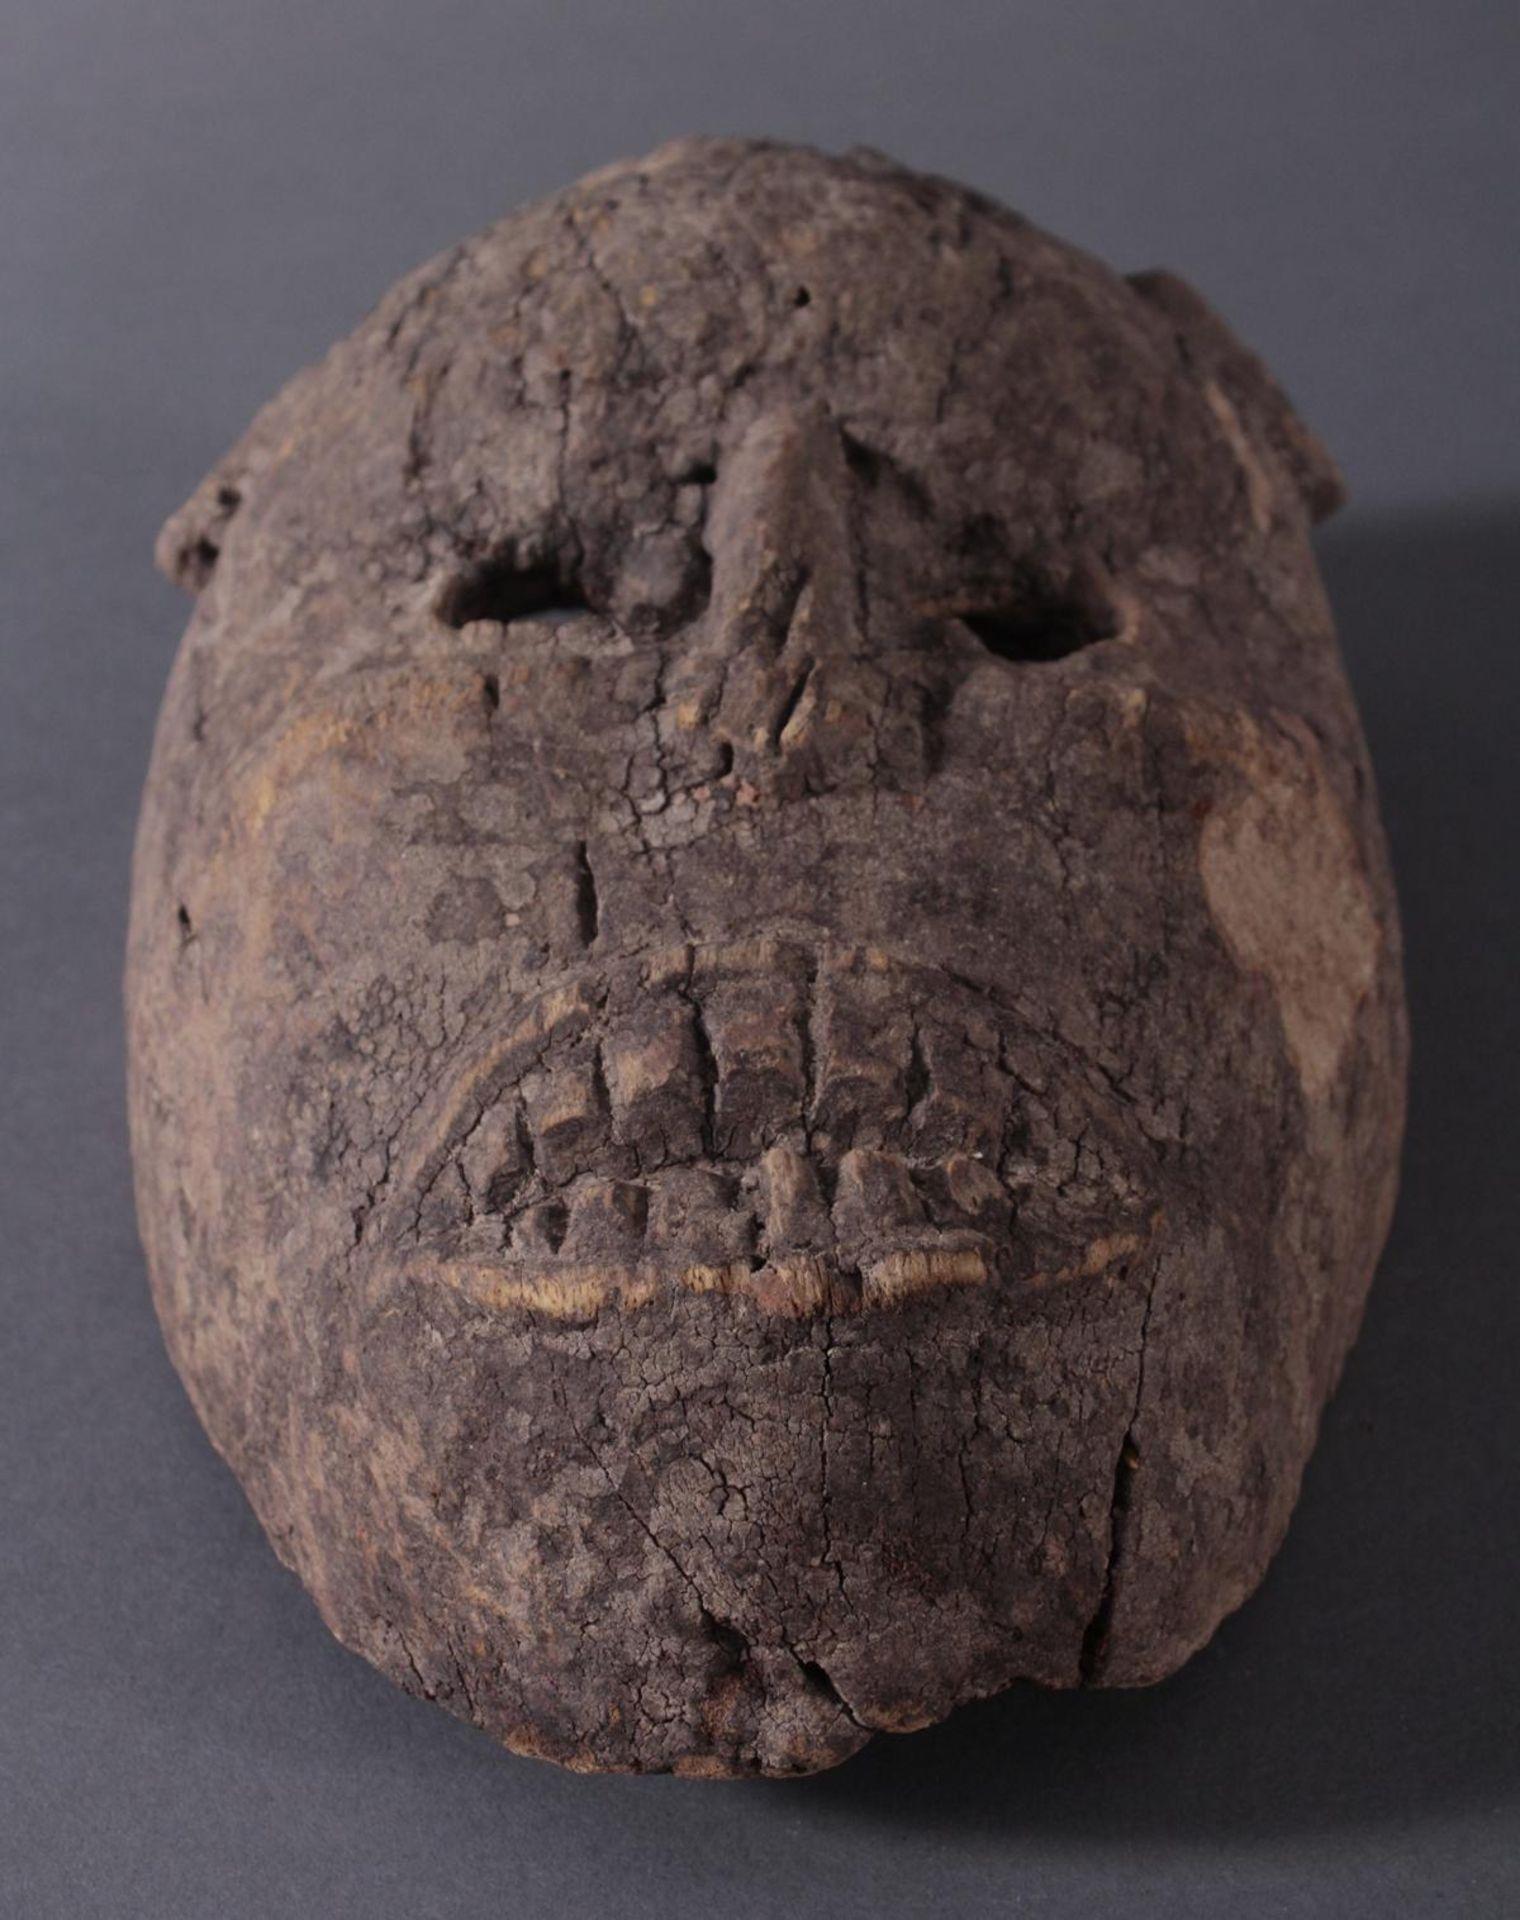 Antike Zoomorphe Maske, Makua, Tansania 1. Hälfte 20. Jh.Hartholzolz, alter Wurmfrass, dunkle Patina - Bild 4 aus 6